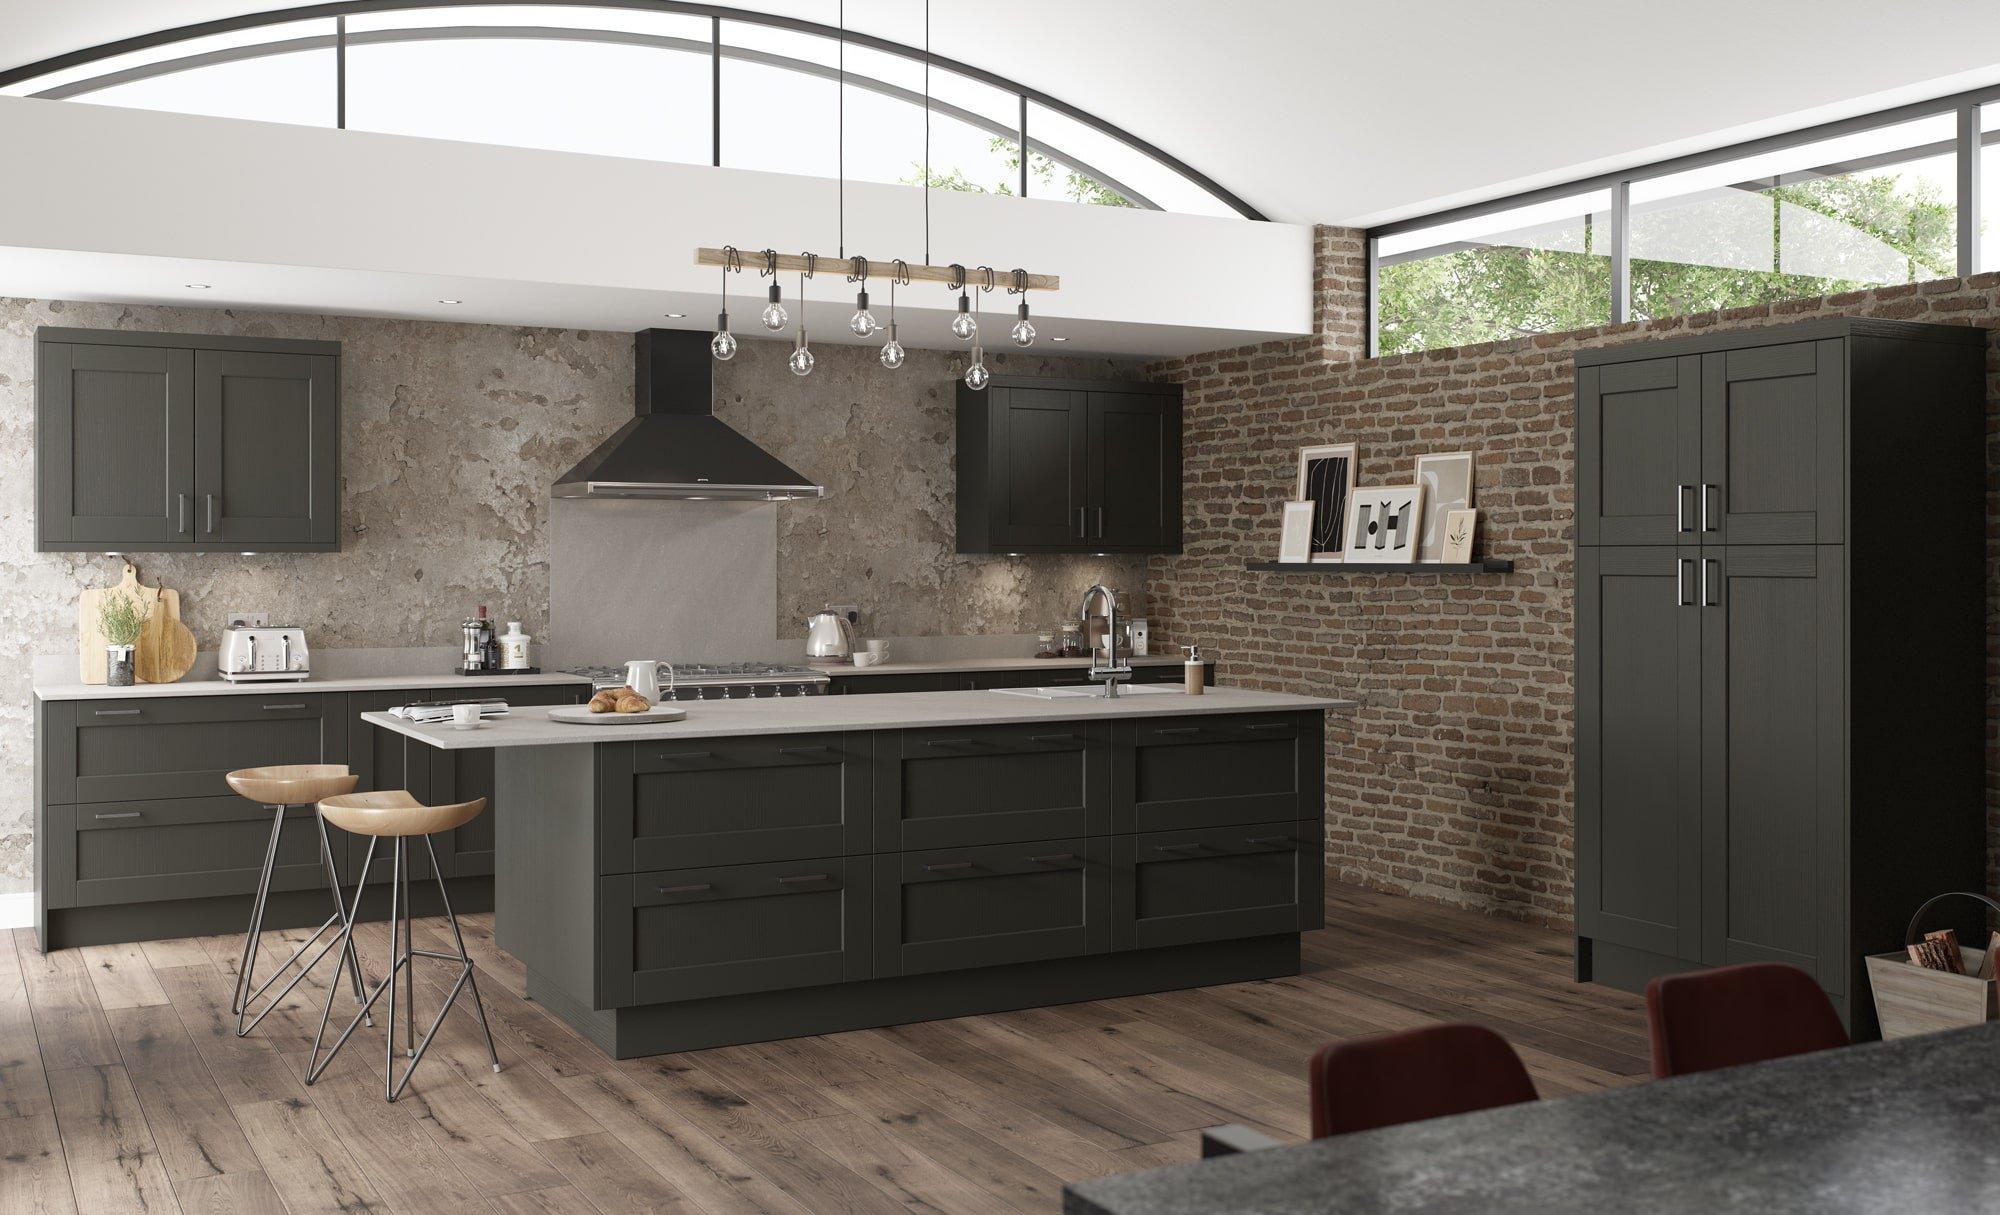 Feeney Interiors - Contemporary Kitchens